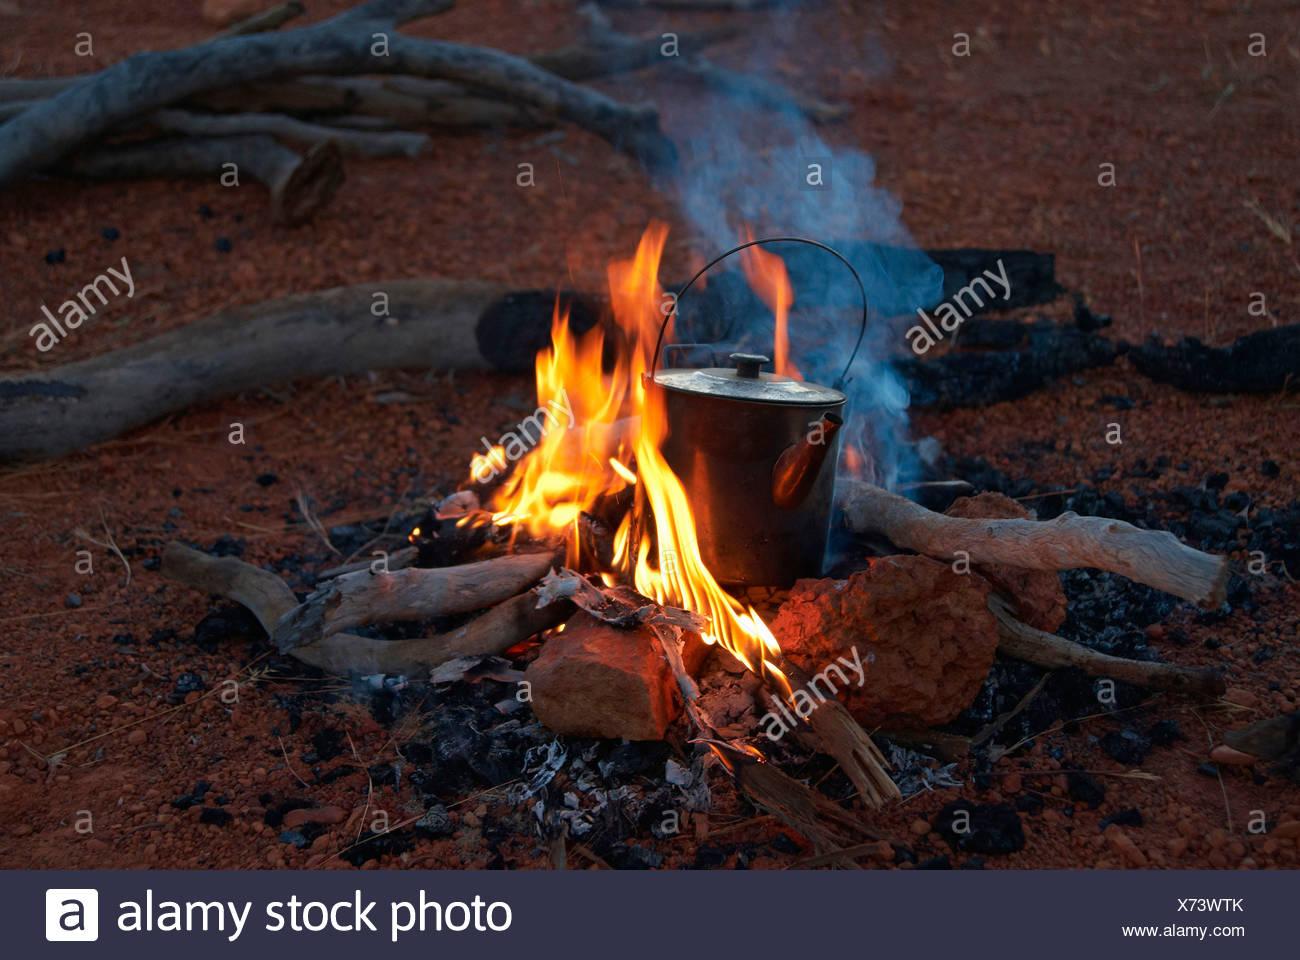 Australia, Queensland, Savannah Way, Burketown, camping, fire, adventure - Stock Image